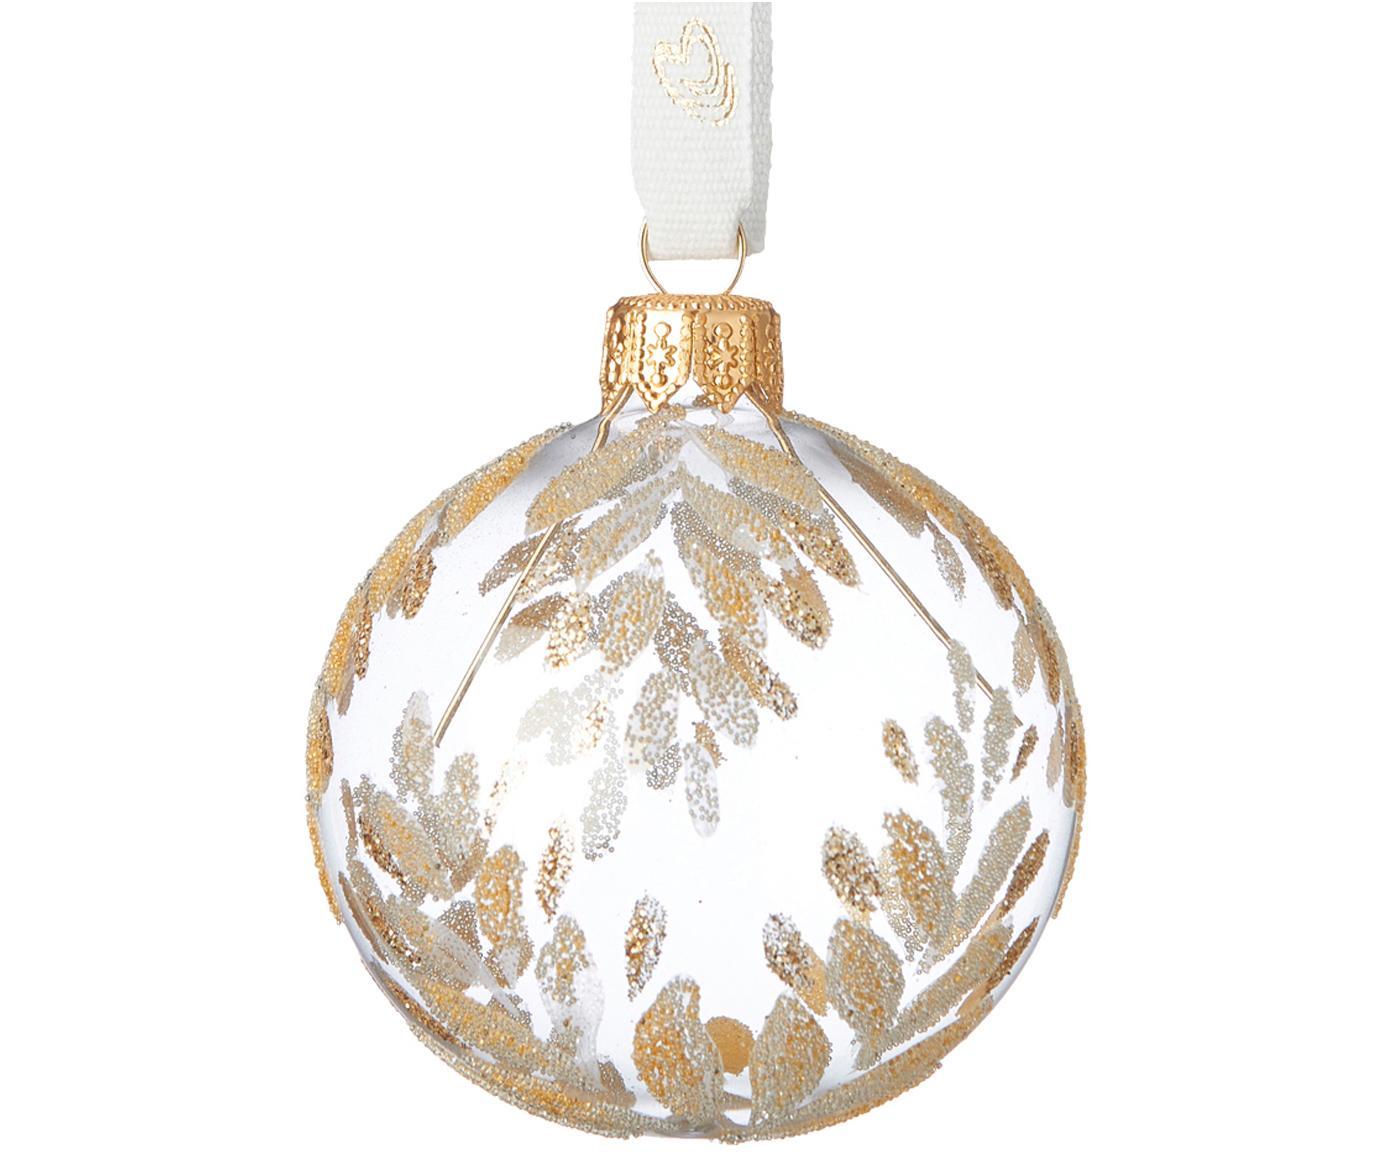 Kerstballen Cadelia, 2 stuks, Transparant, goudkleurig, Ø 6 x H 6 cm